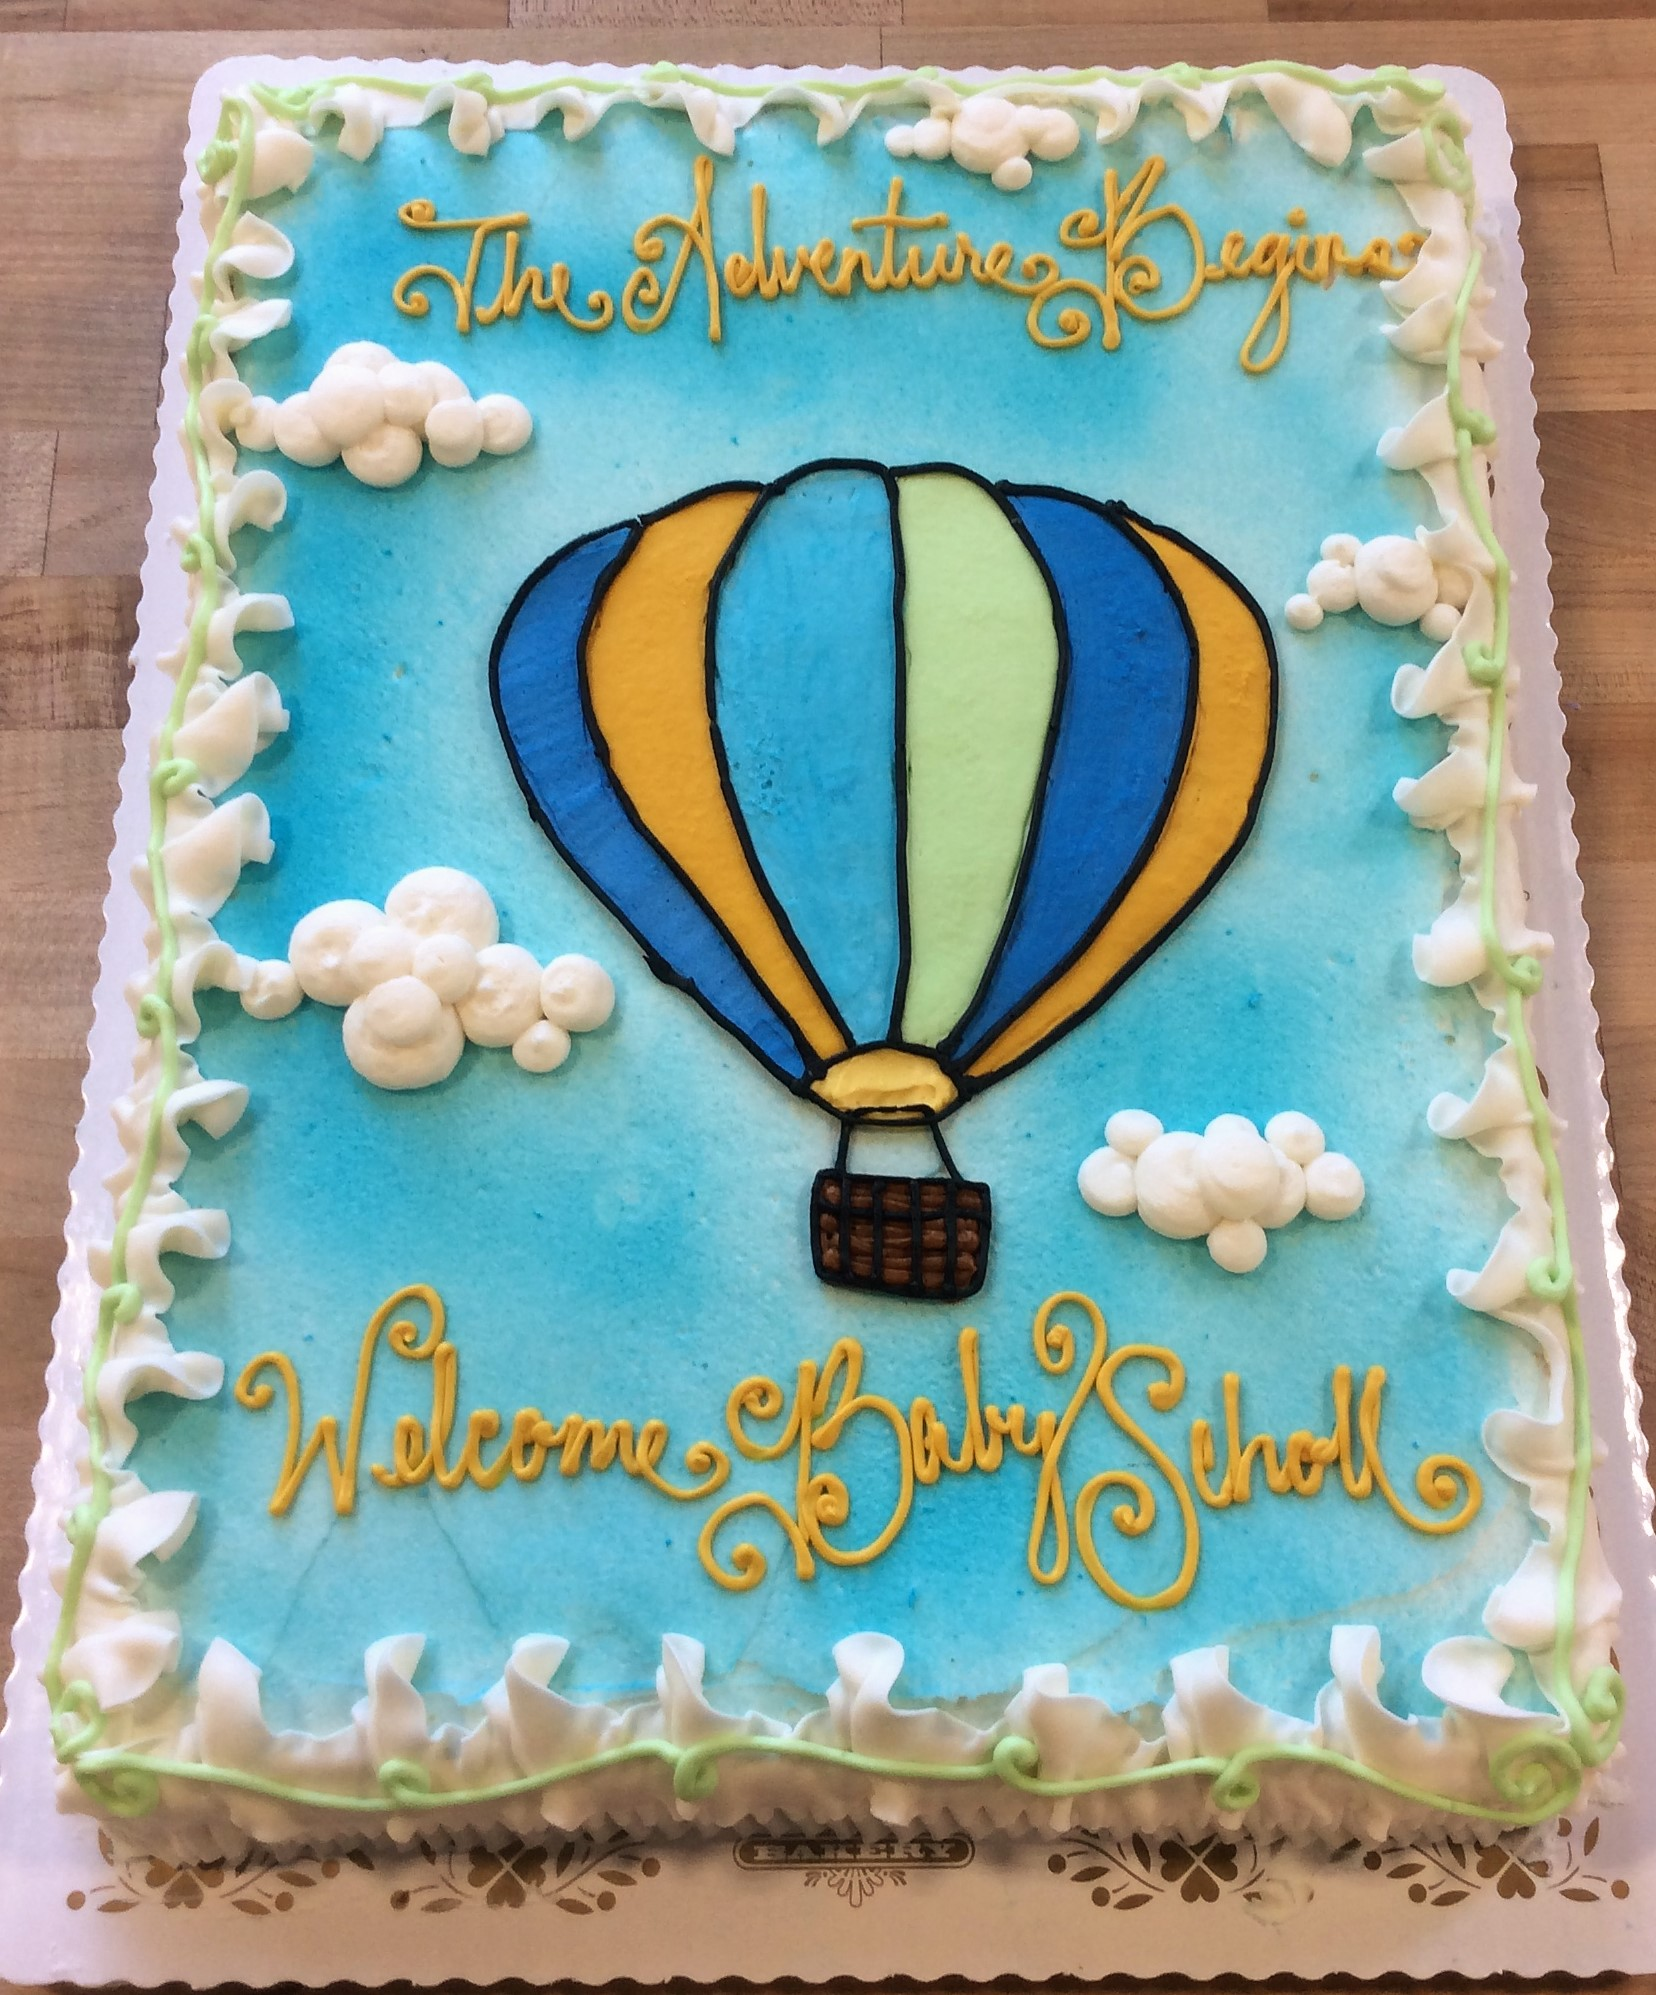 Hot air balloon decorated cake also sheet  trefzger  bakery rh trefzgersbakery